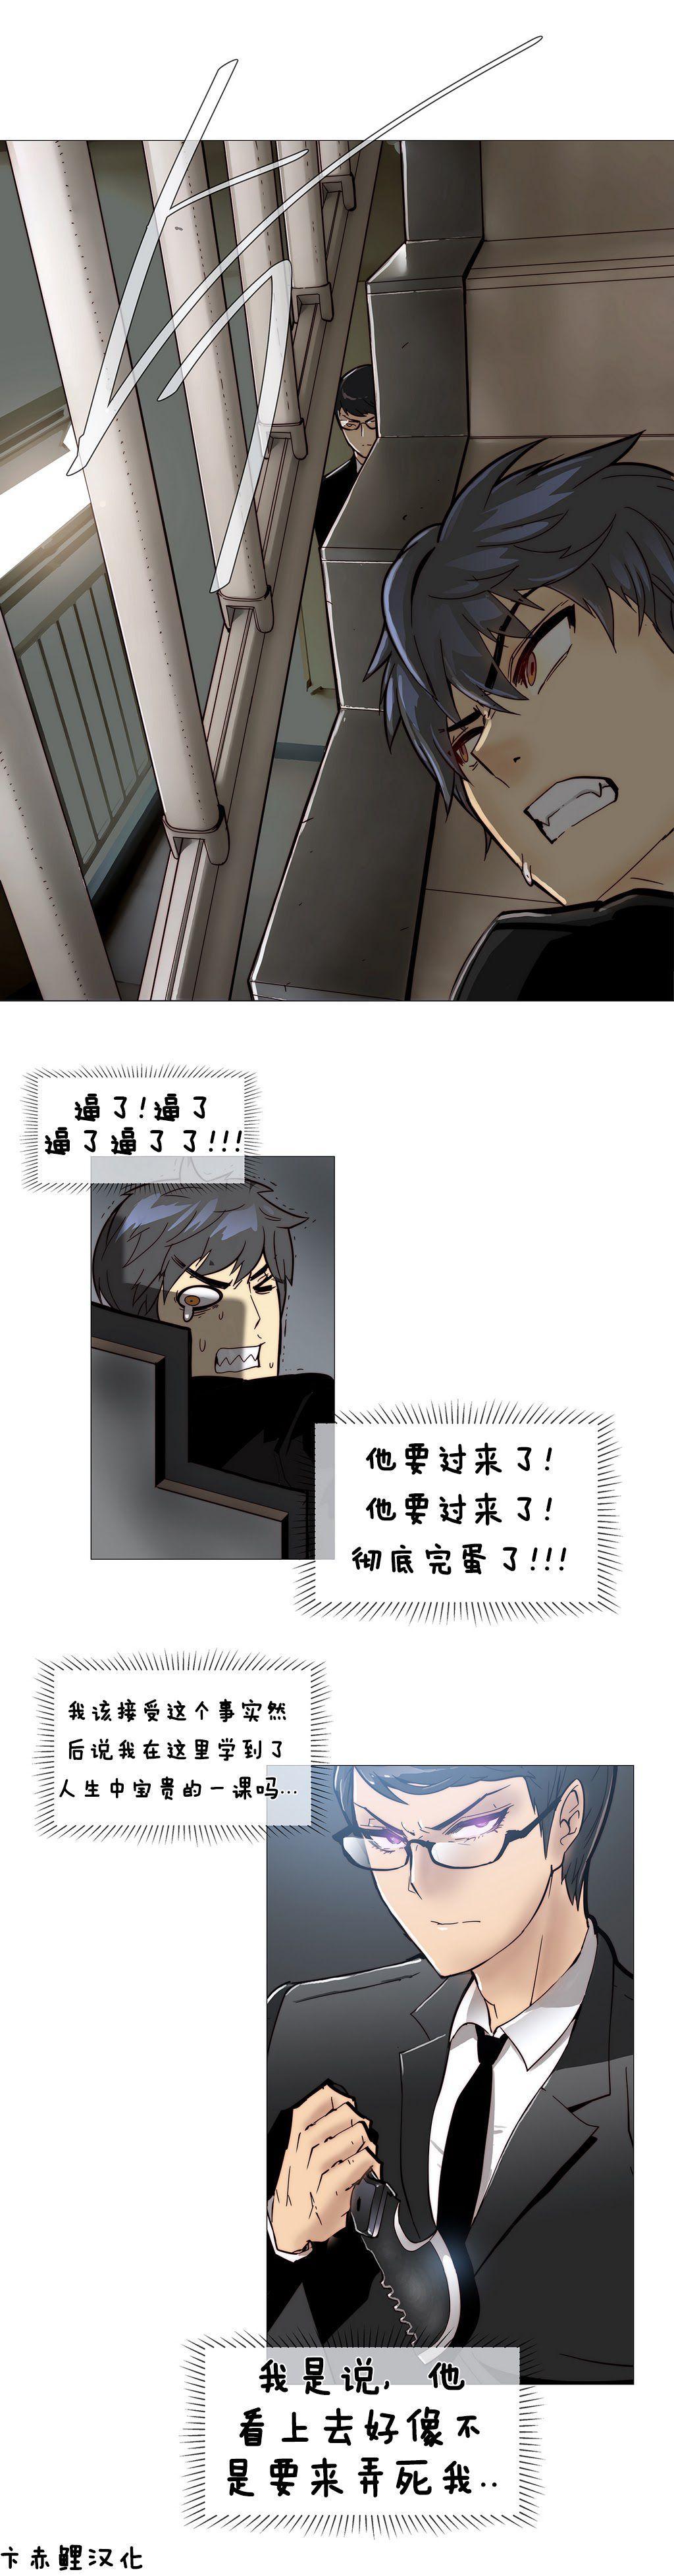 HouseHold Affairs 【卞赤鲤个人汉化】1~33话(持续更新中) 143